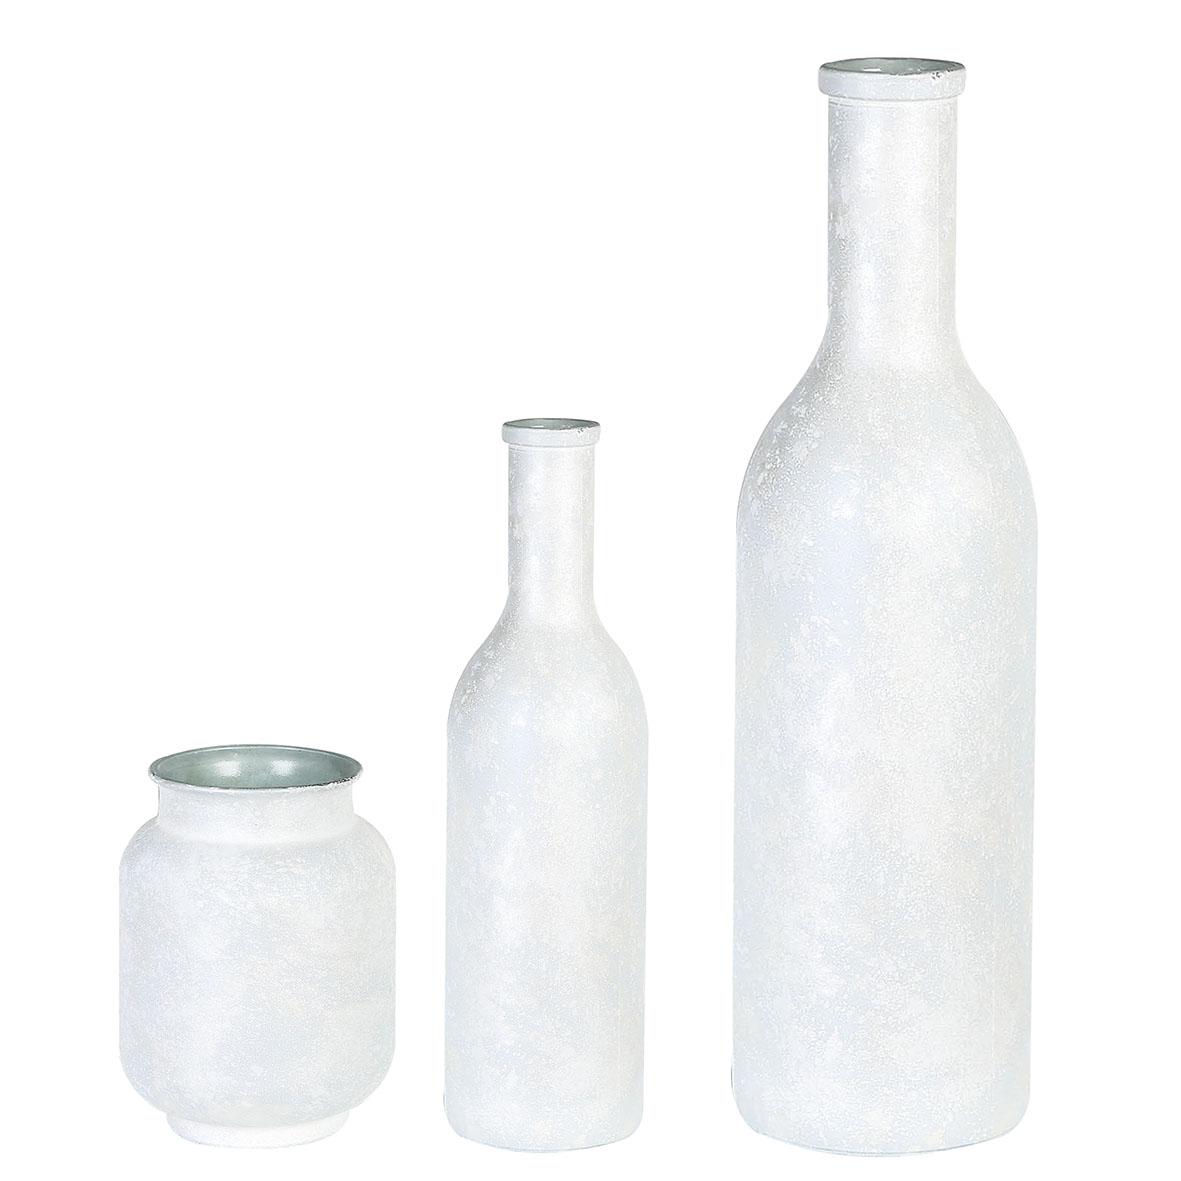 Váza Myra, 50 cm, bílá / stříbrná